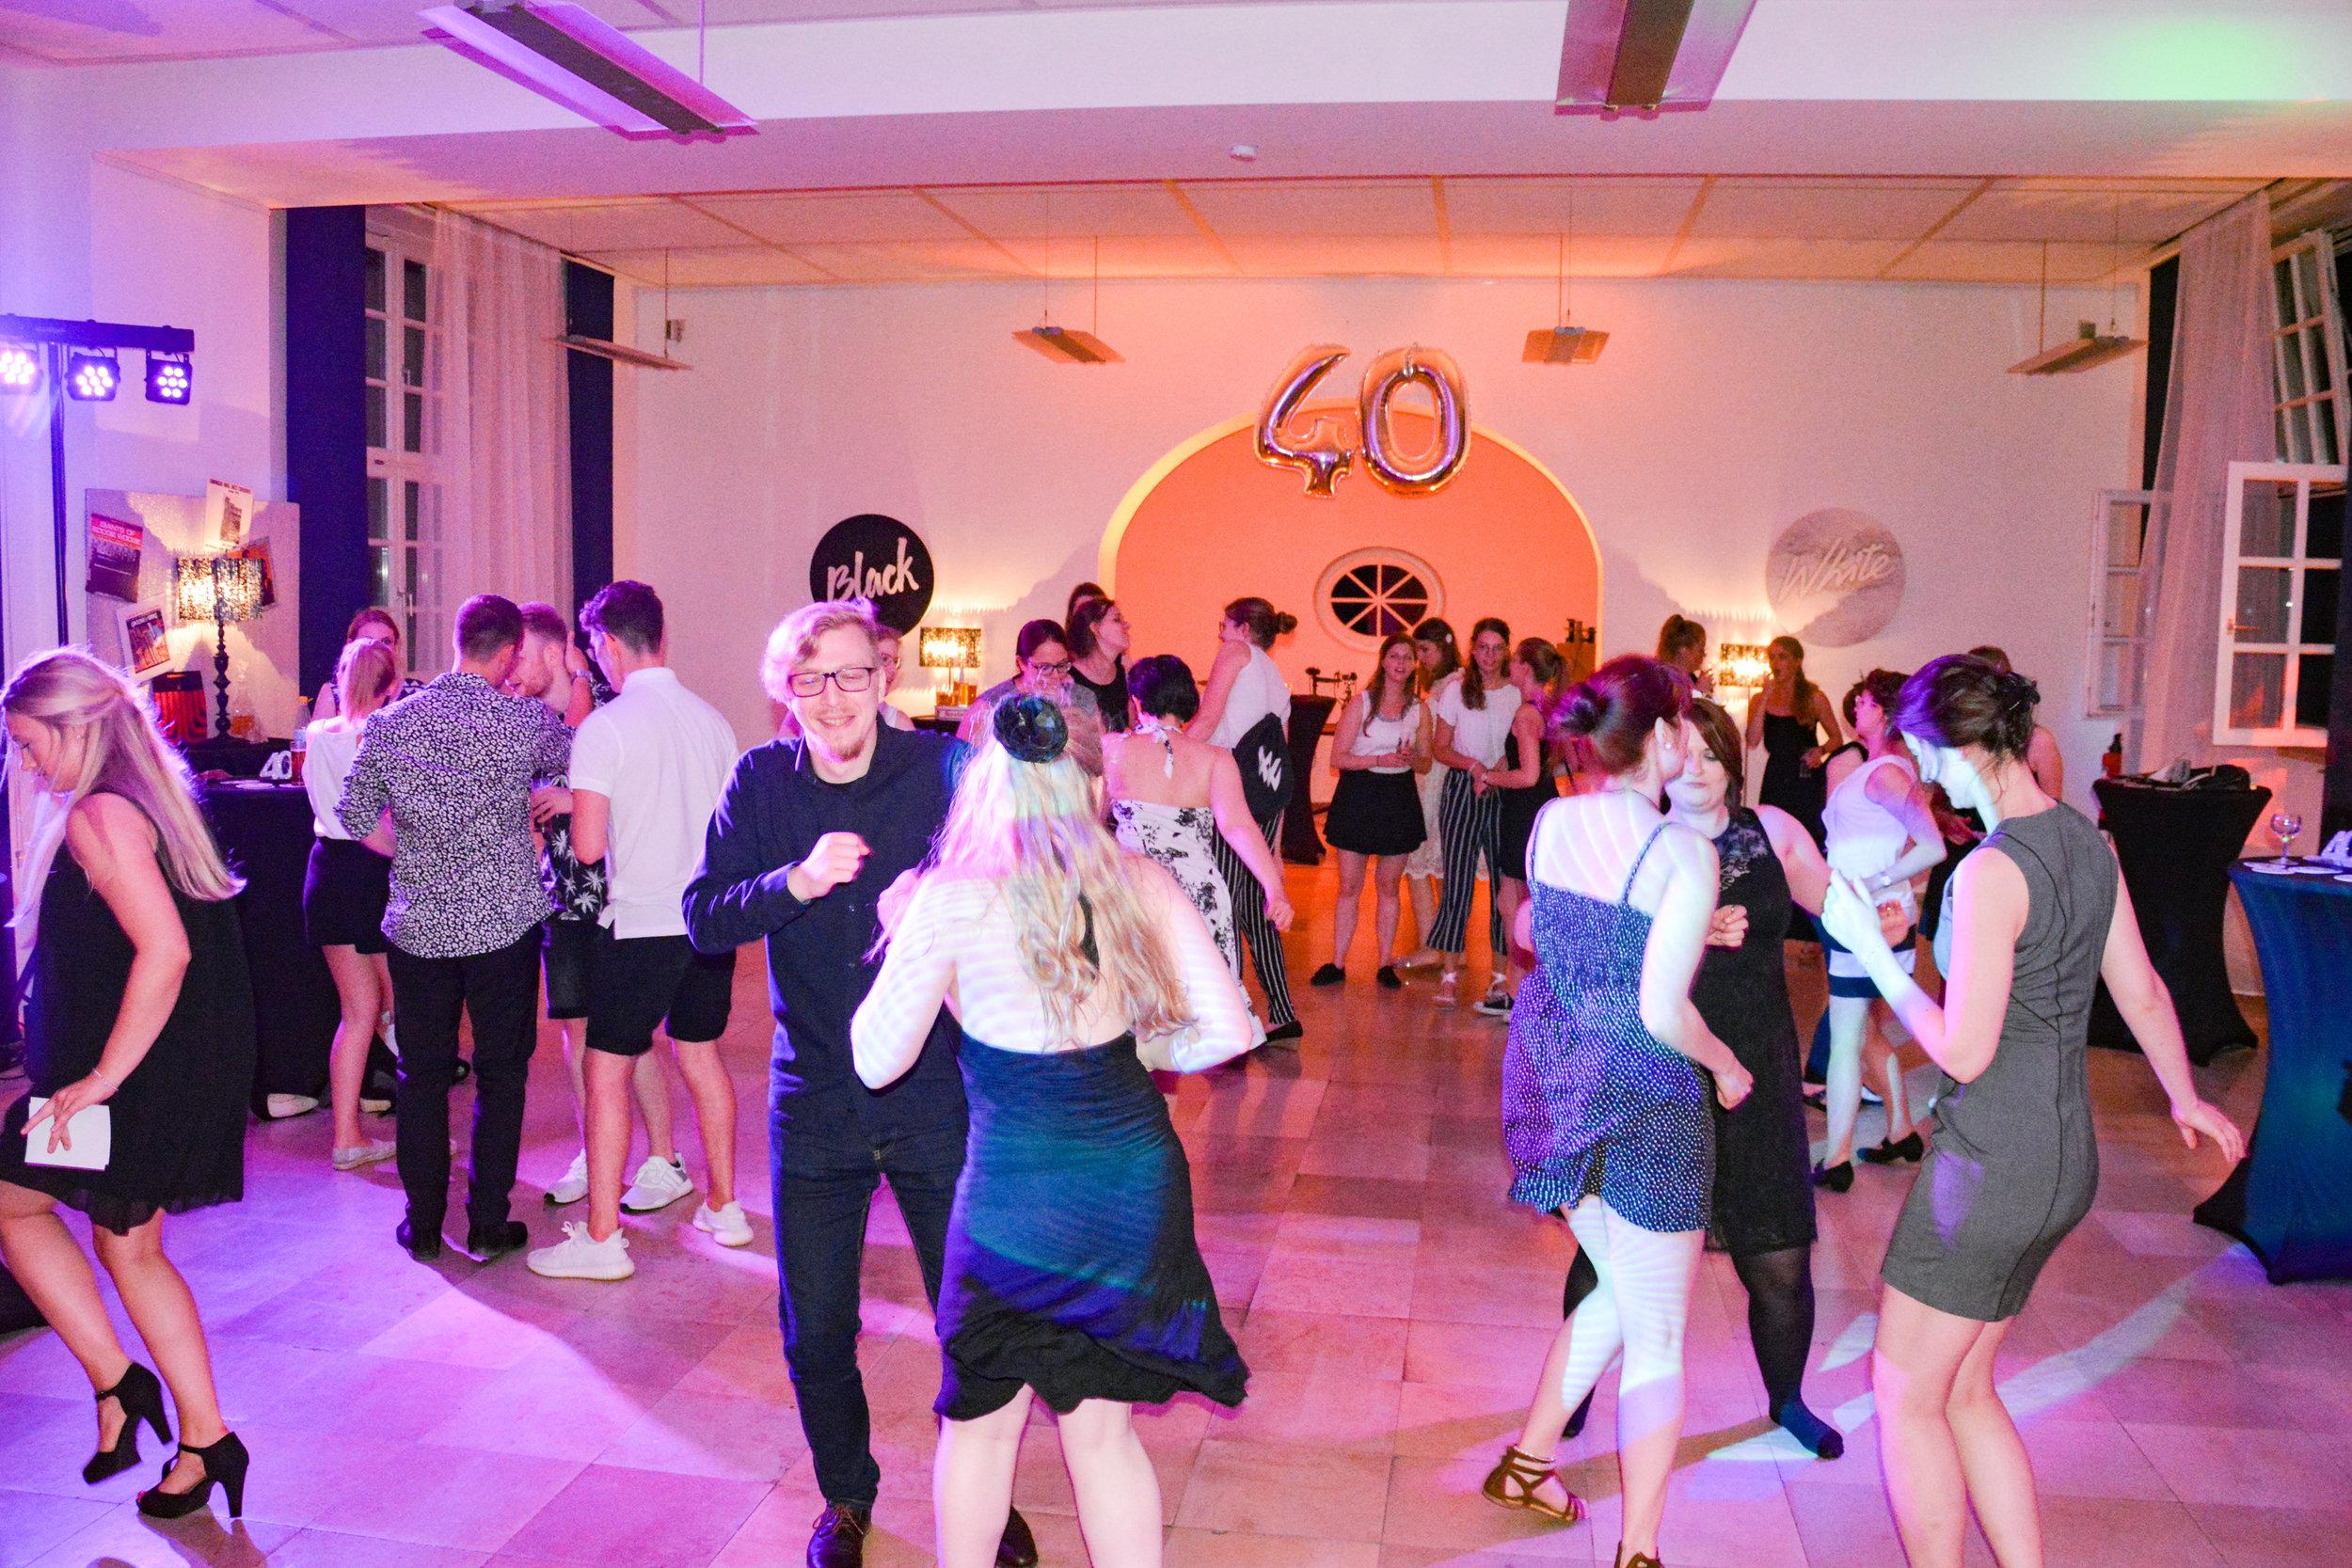 20190626_Akademie_40-jähriges_Jubiläum_Party_kl-0177.jpg